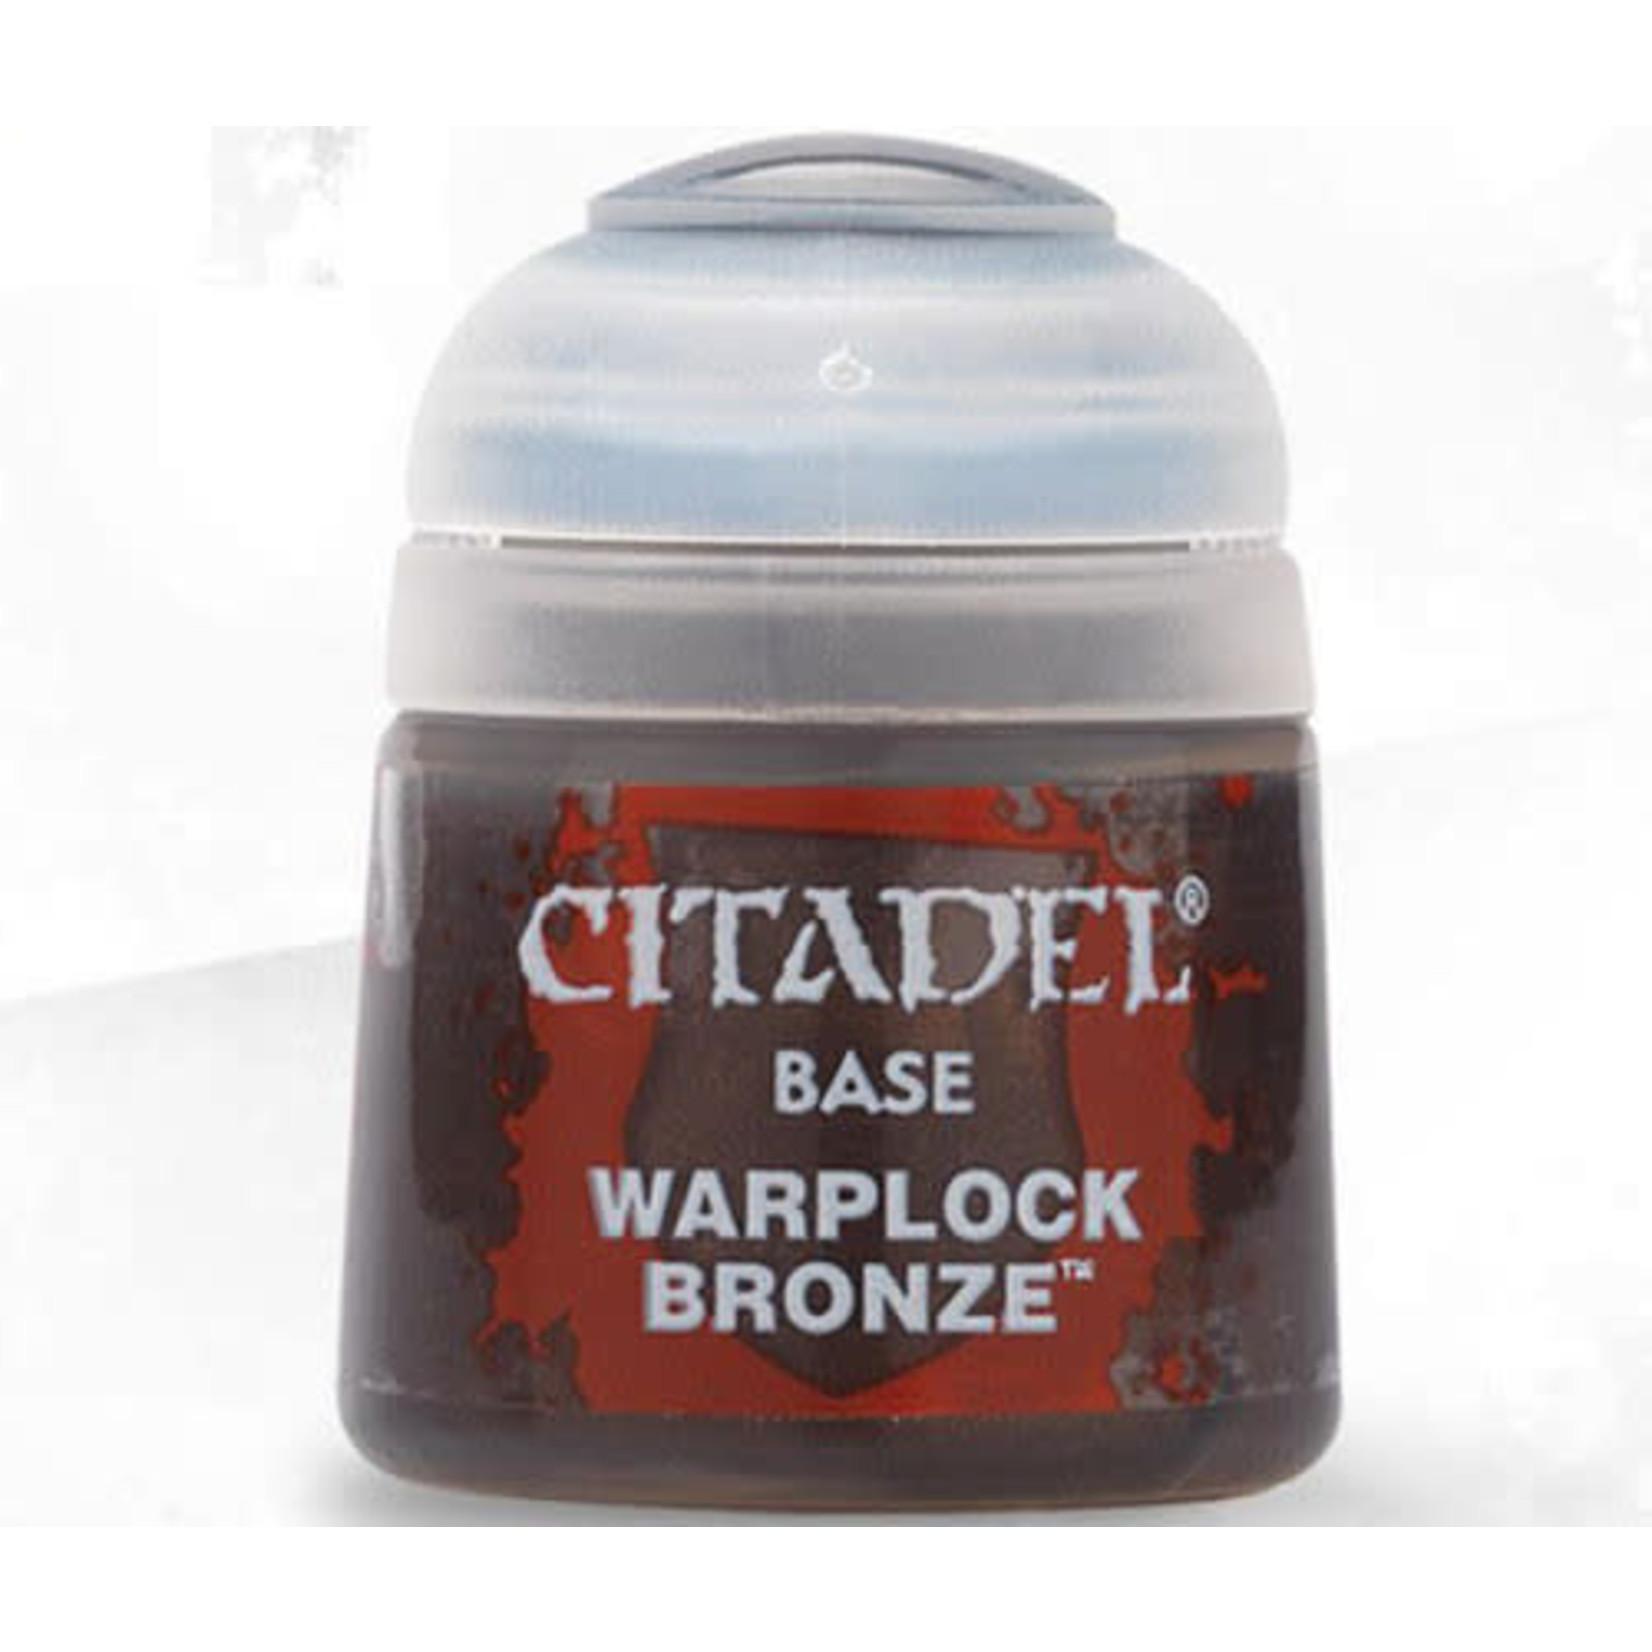 Citadel Citadel Paint - Base: Warplock Bronze